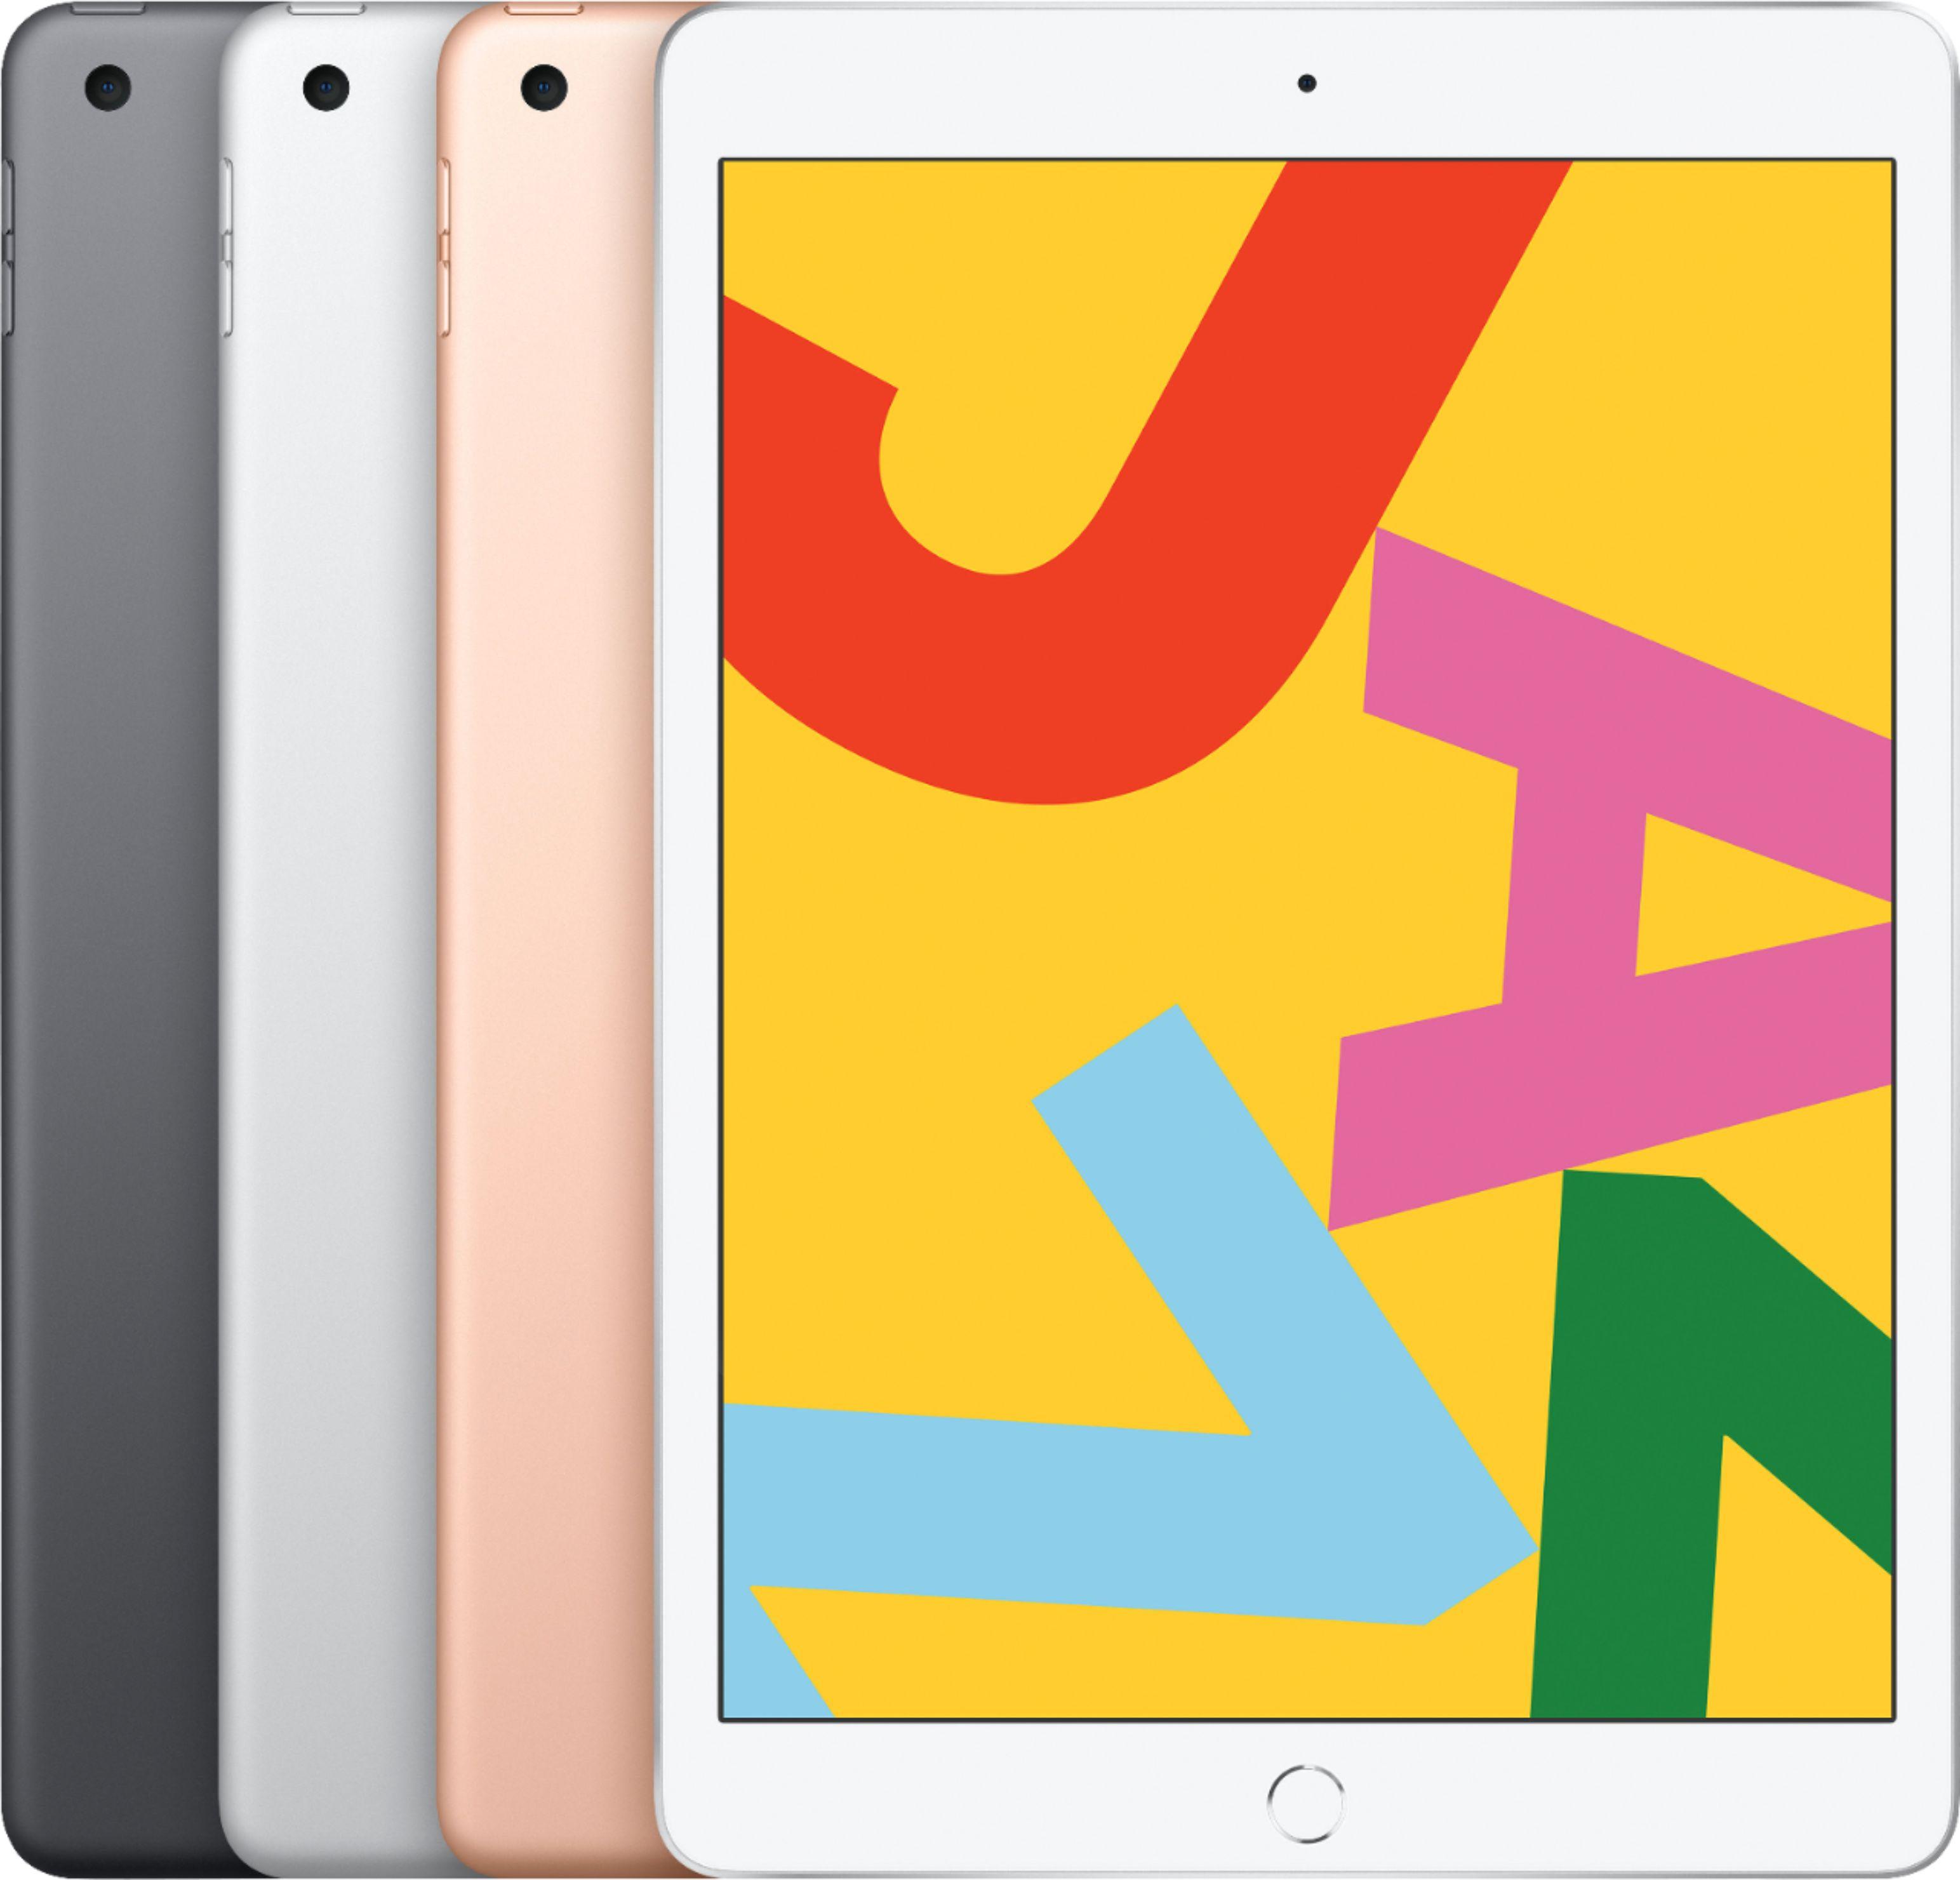 iPad 7 - 2019 (Latest Model) 32B, Best Buy $279.99